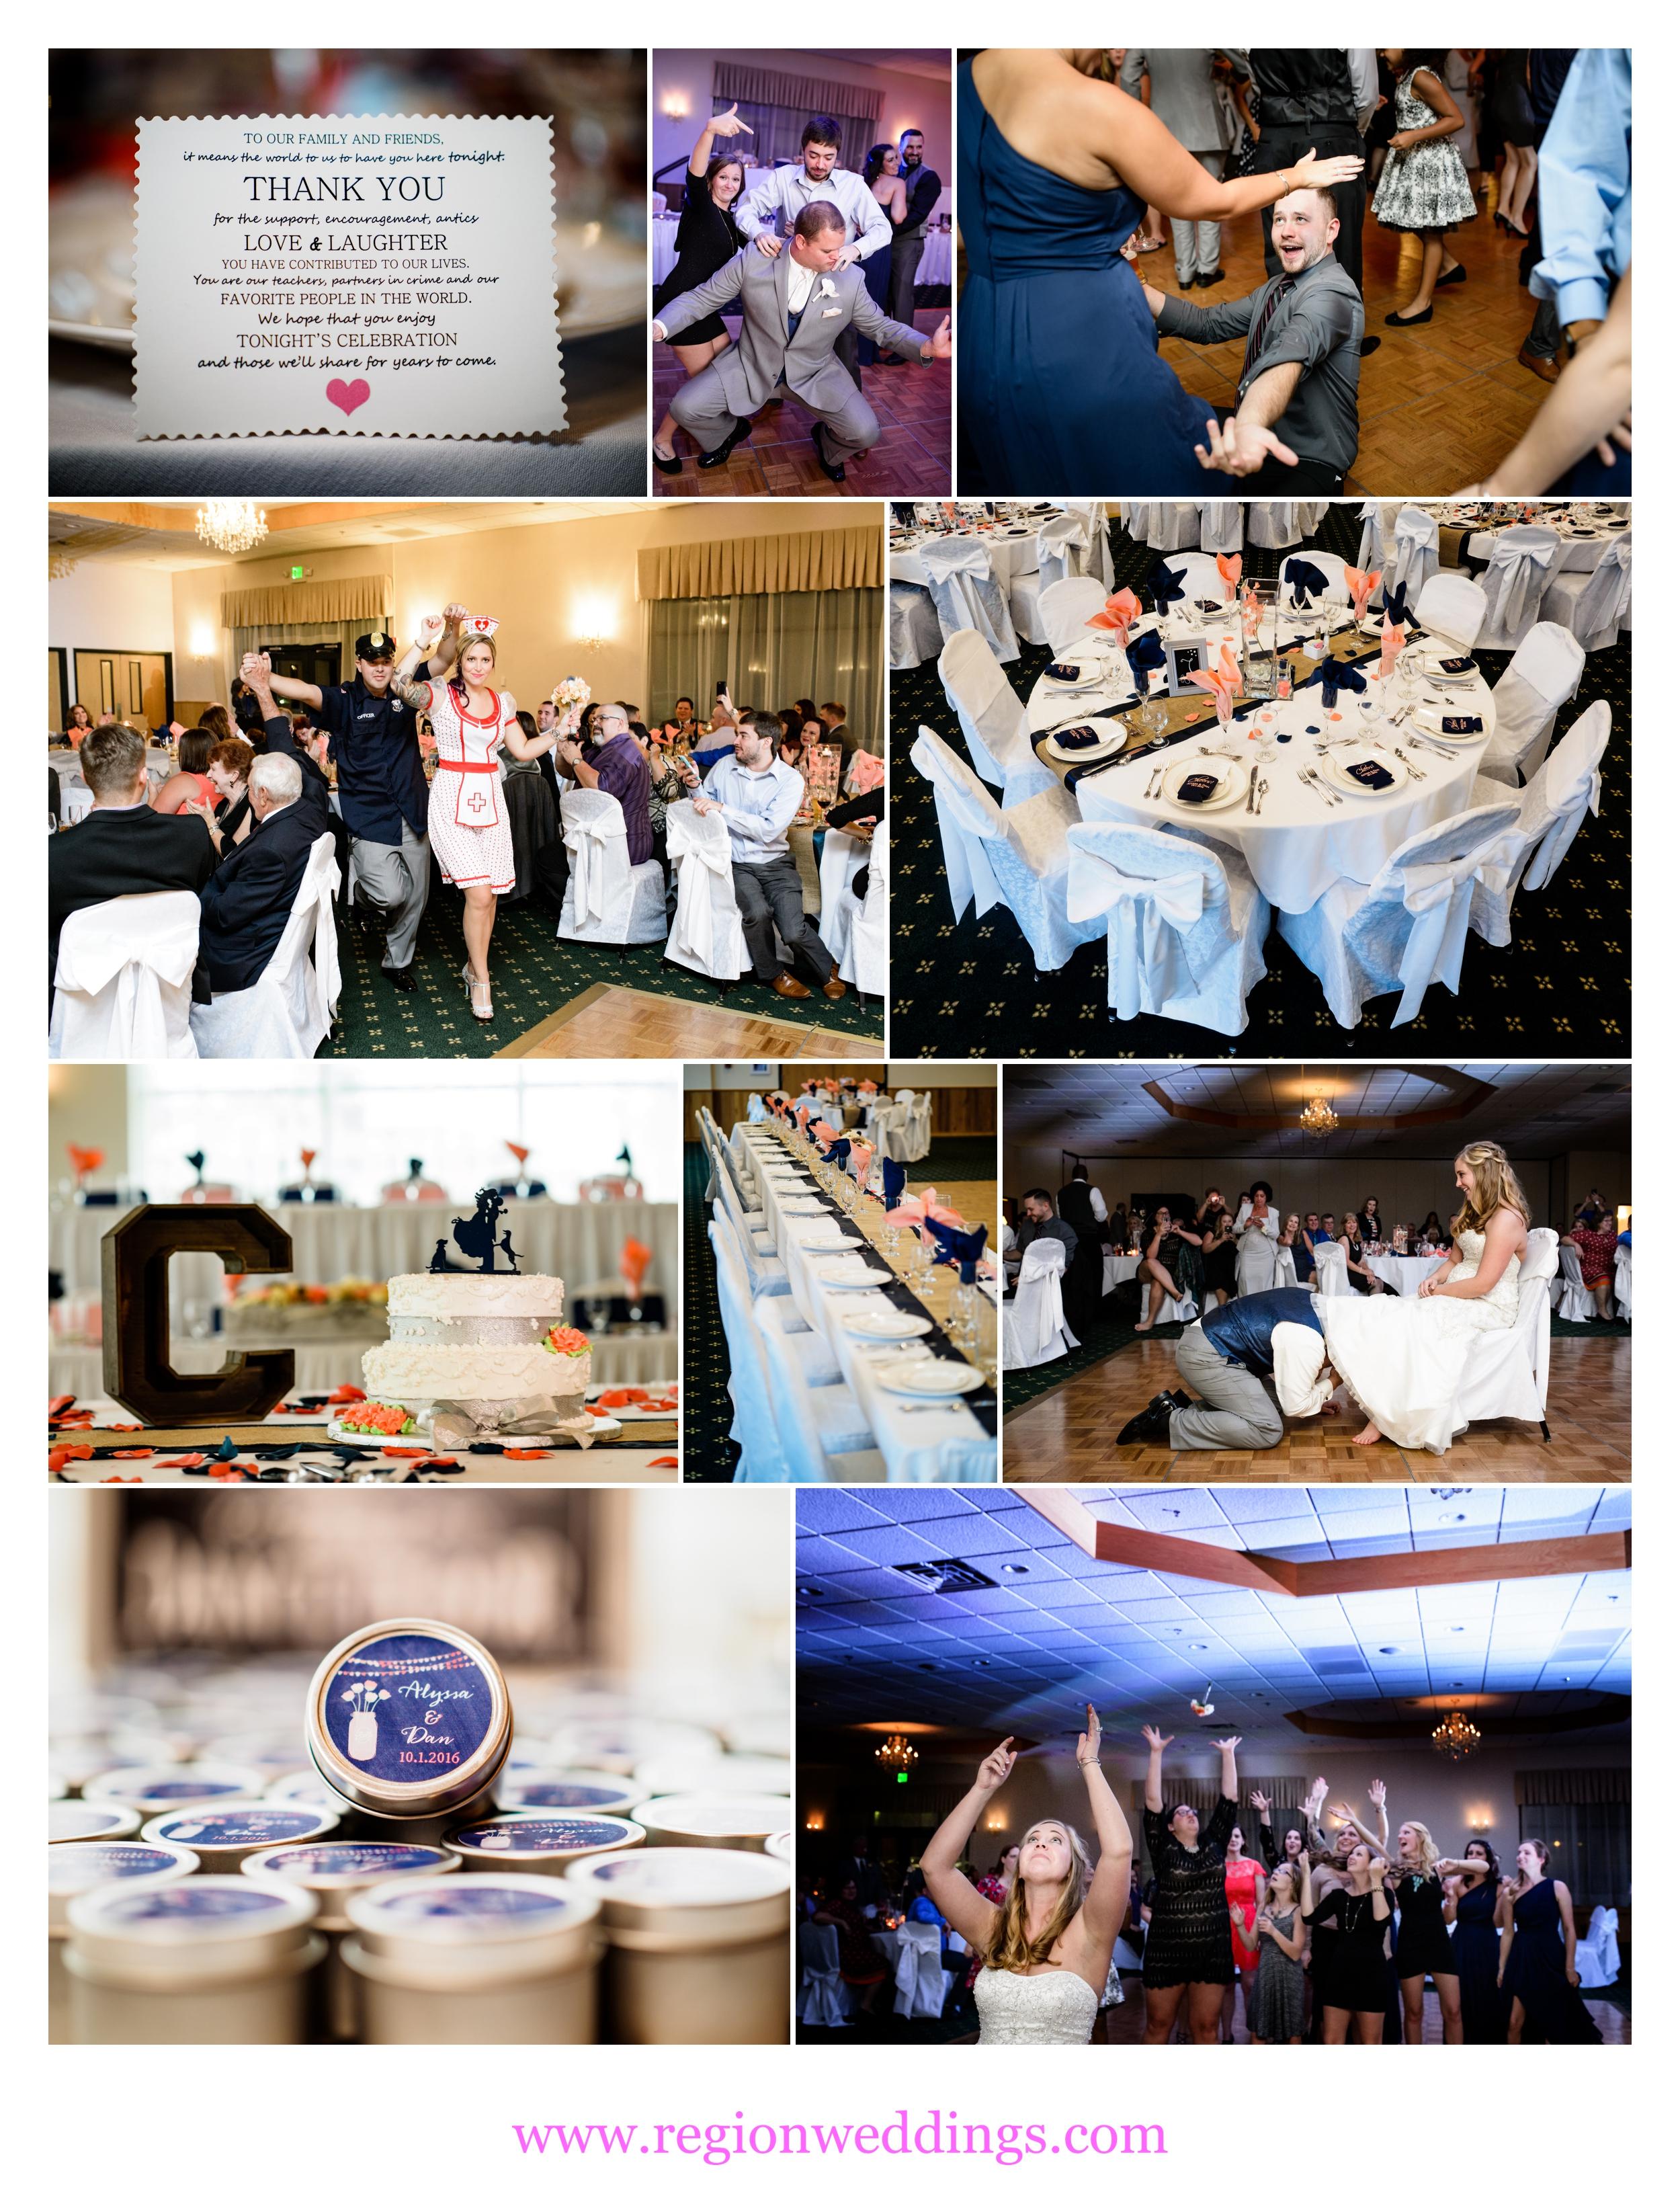 An October wedding reception at The Patrician Banquet Center.